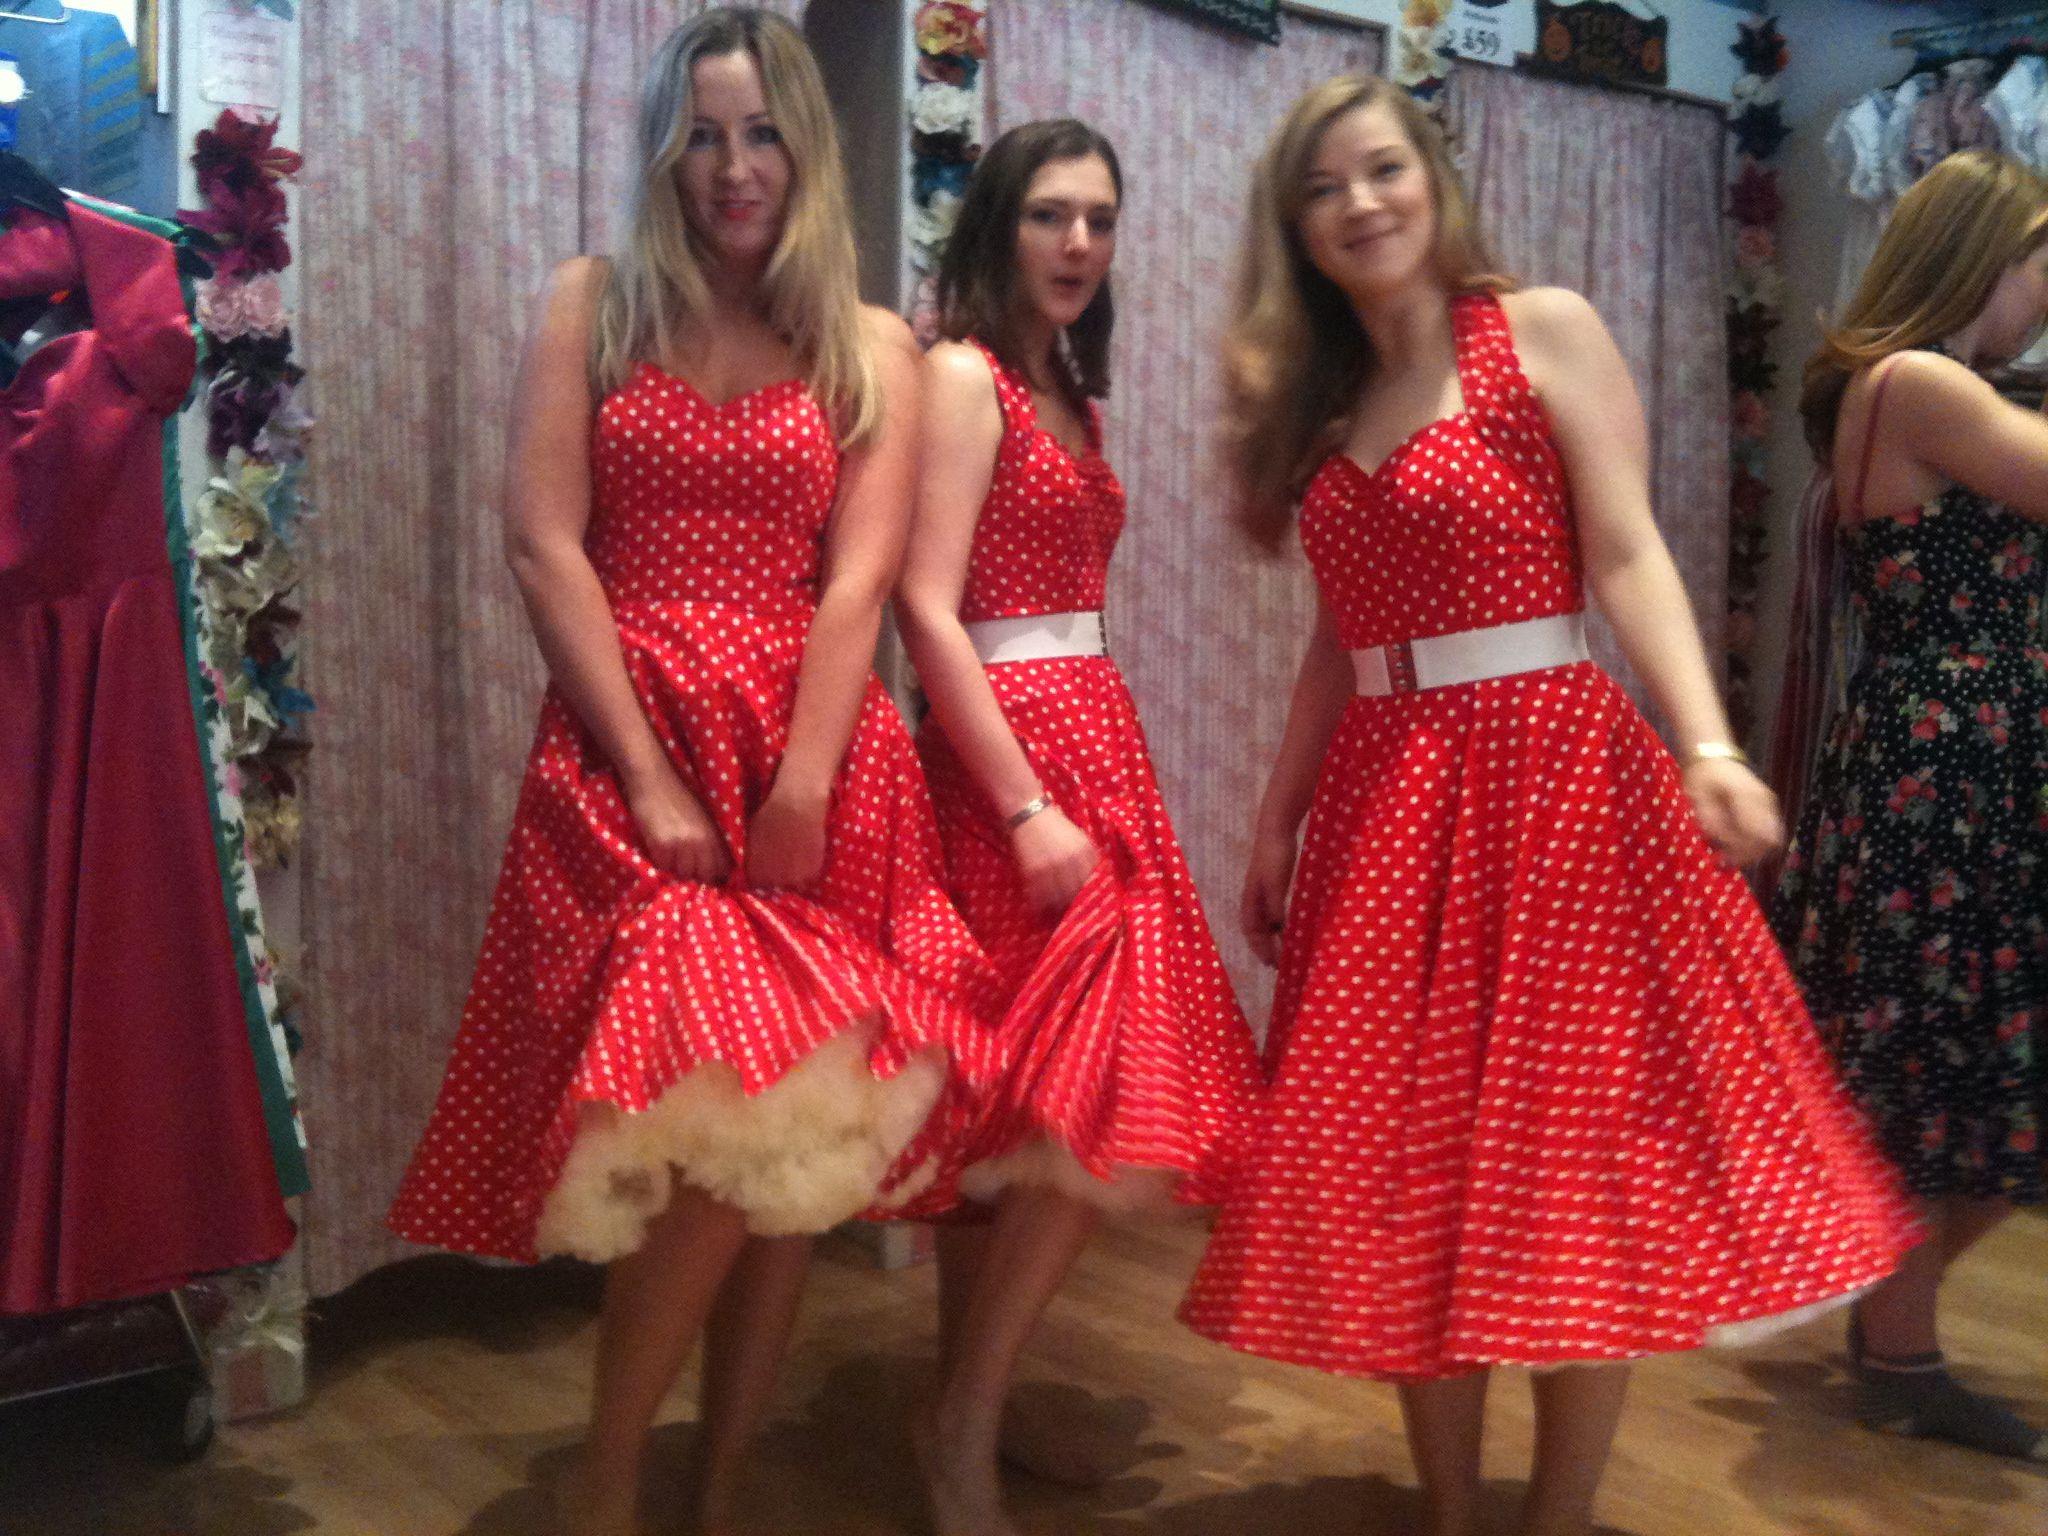 Wedding dress boxing  Bridesmaid dresses  dressingupbox  Pinterest  Dressings